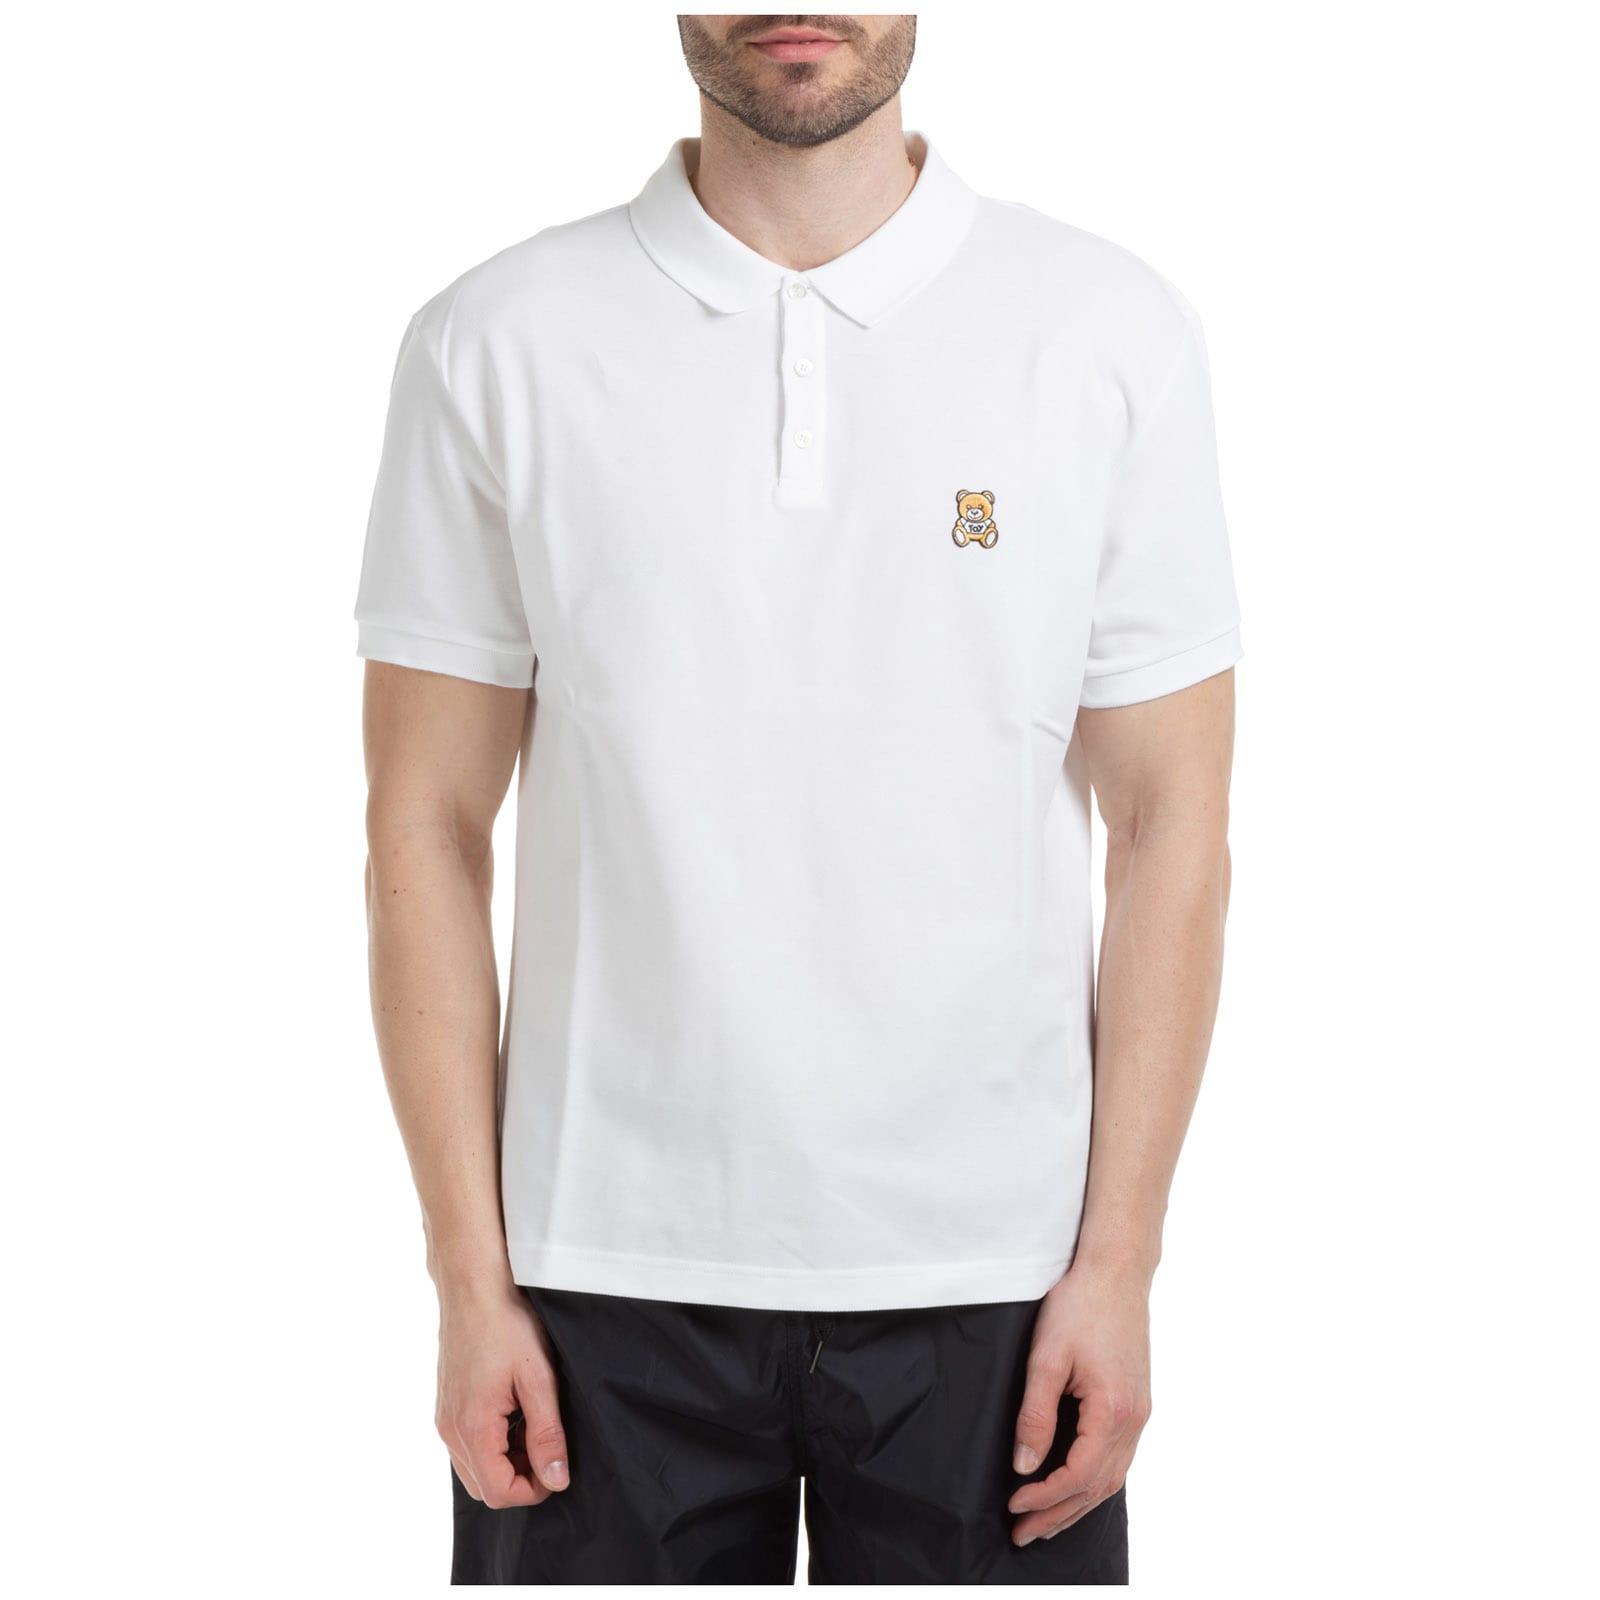 Moschino Teddy Polo Shirts